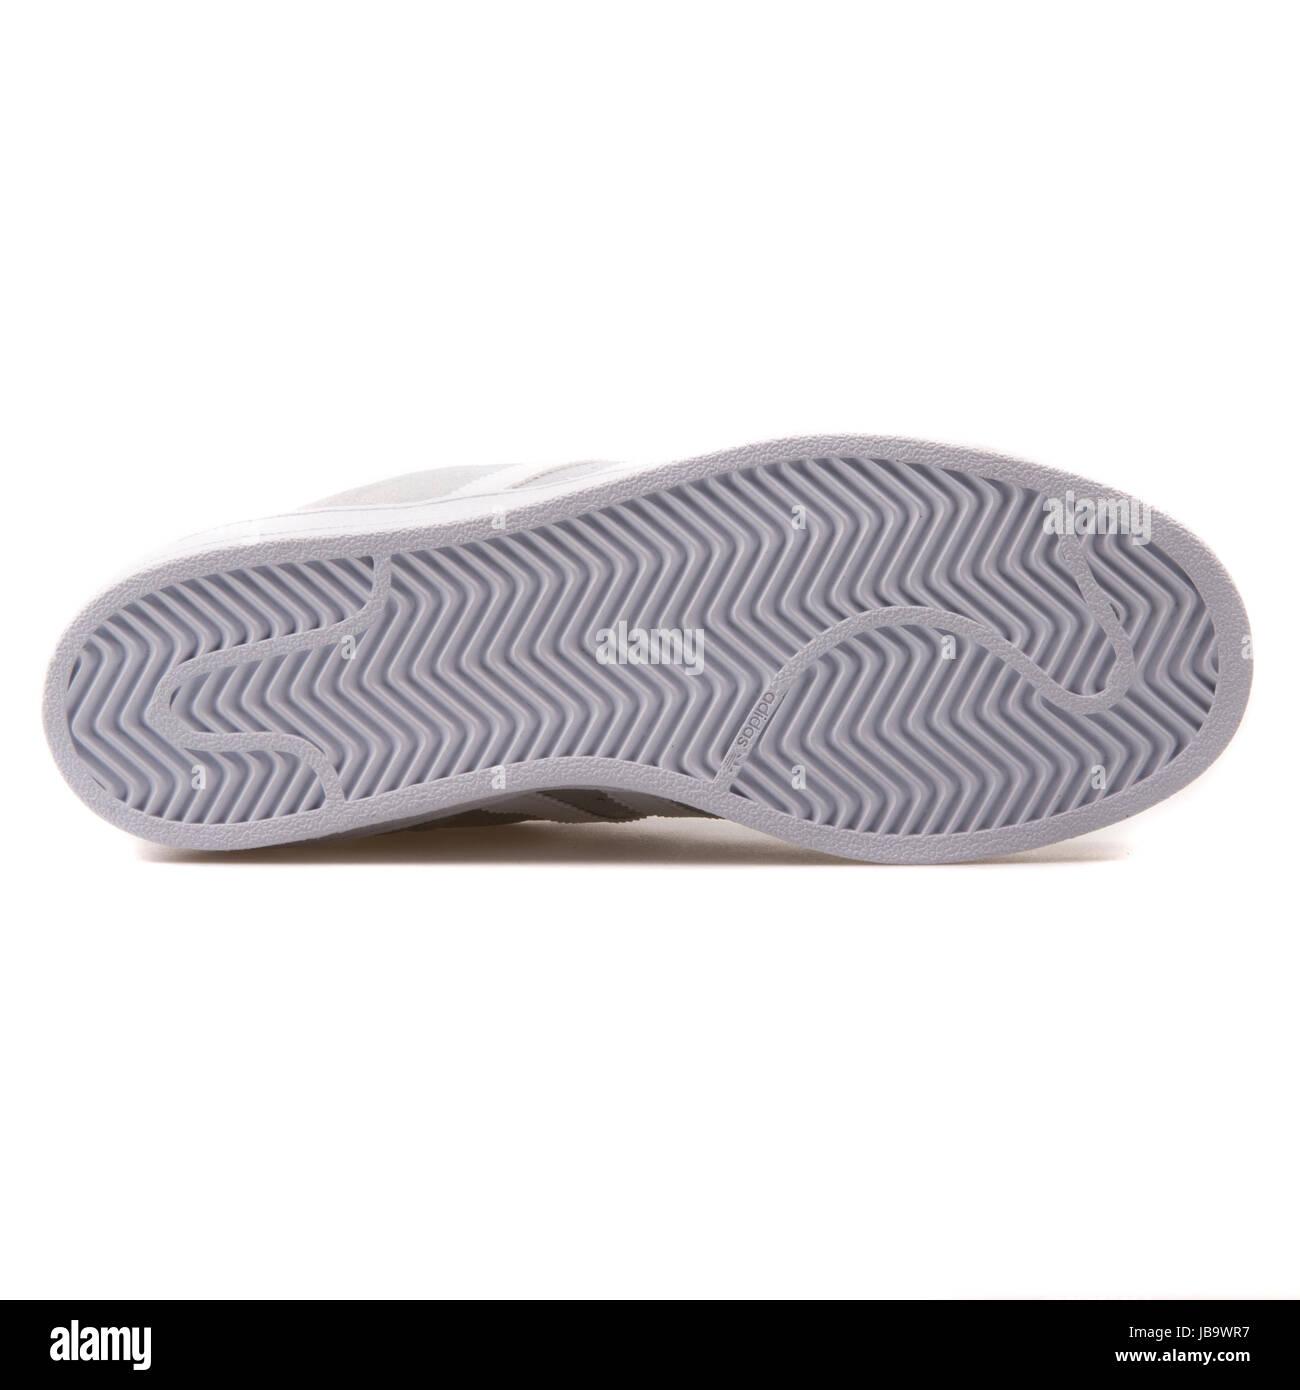 Adidas Superstar W Hologram Iridescent Women's Shoes